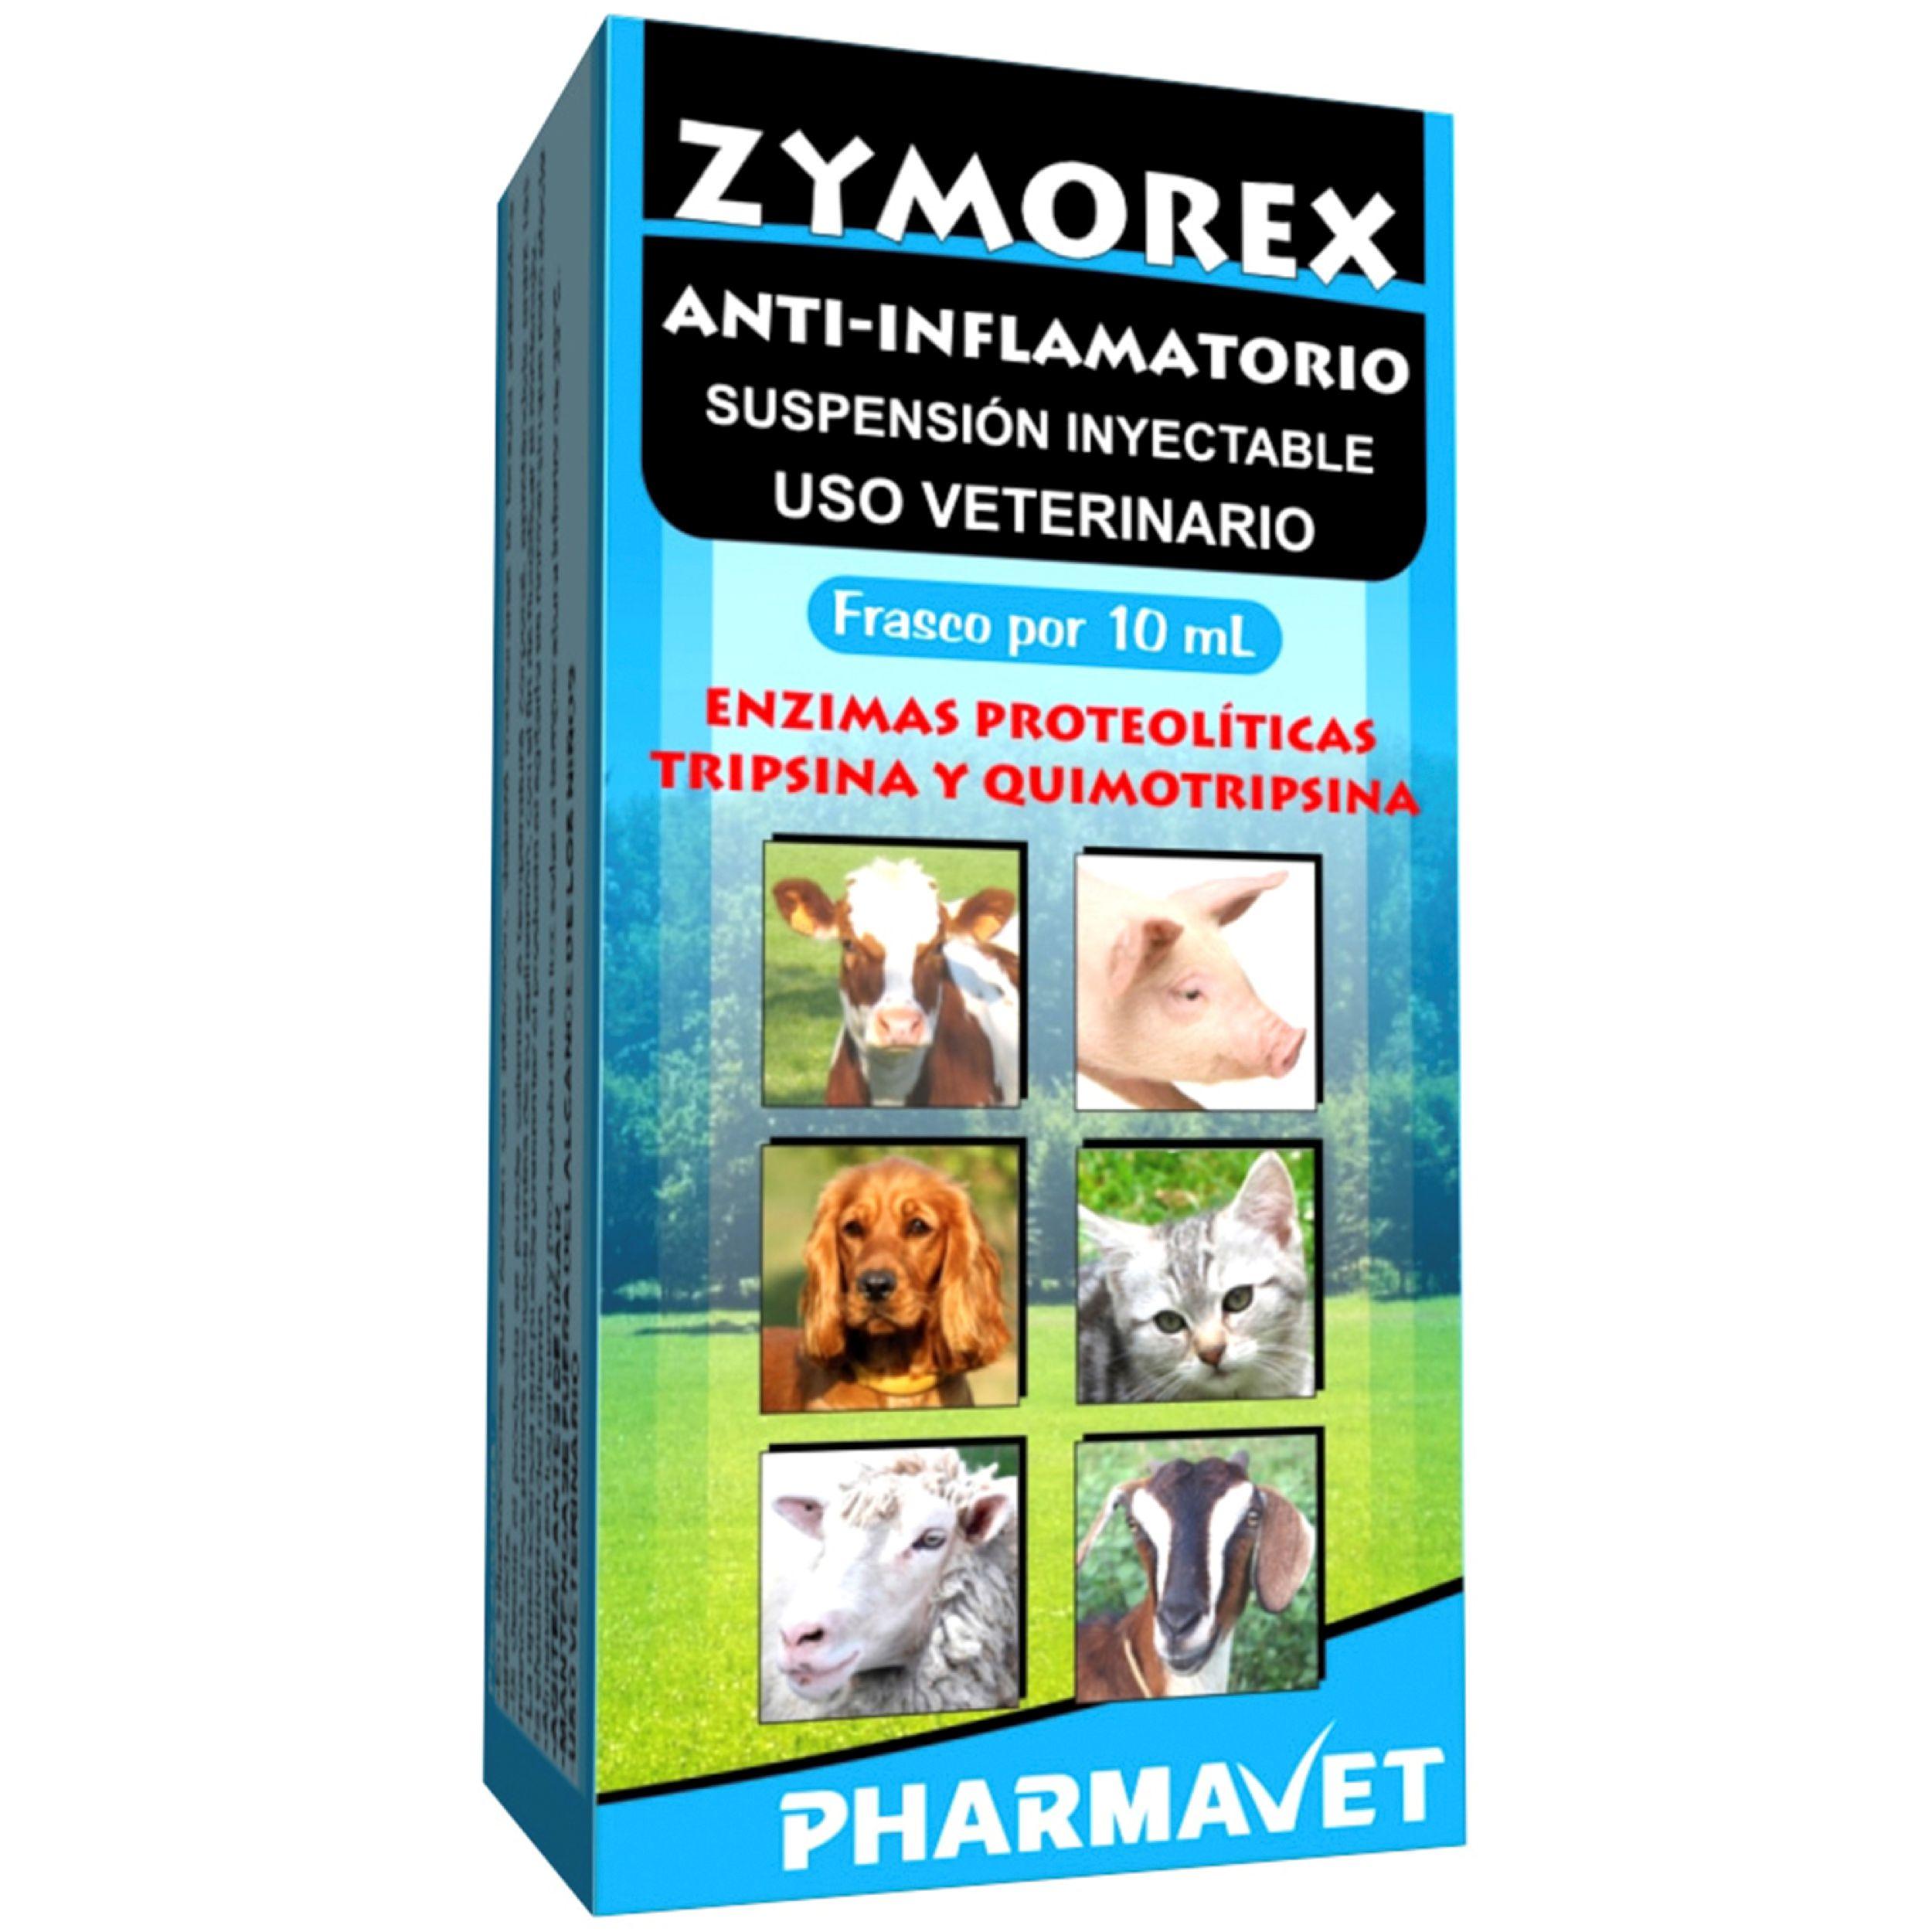 Zymorex